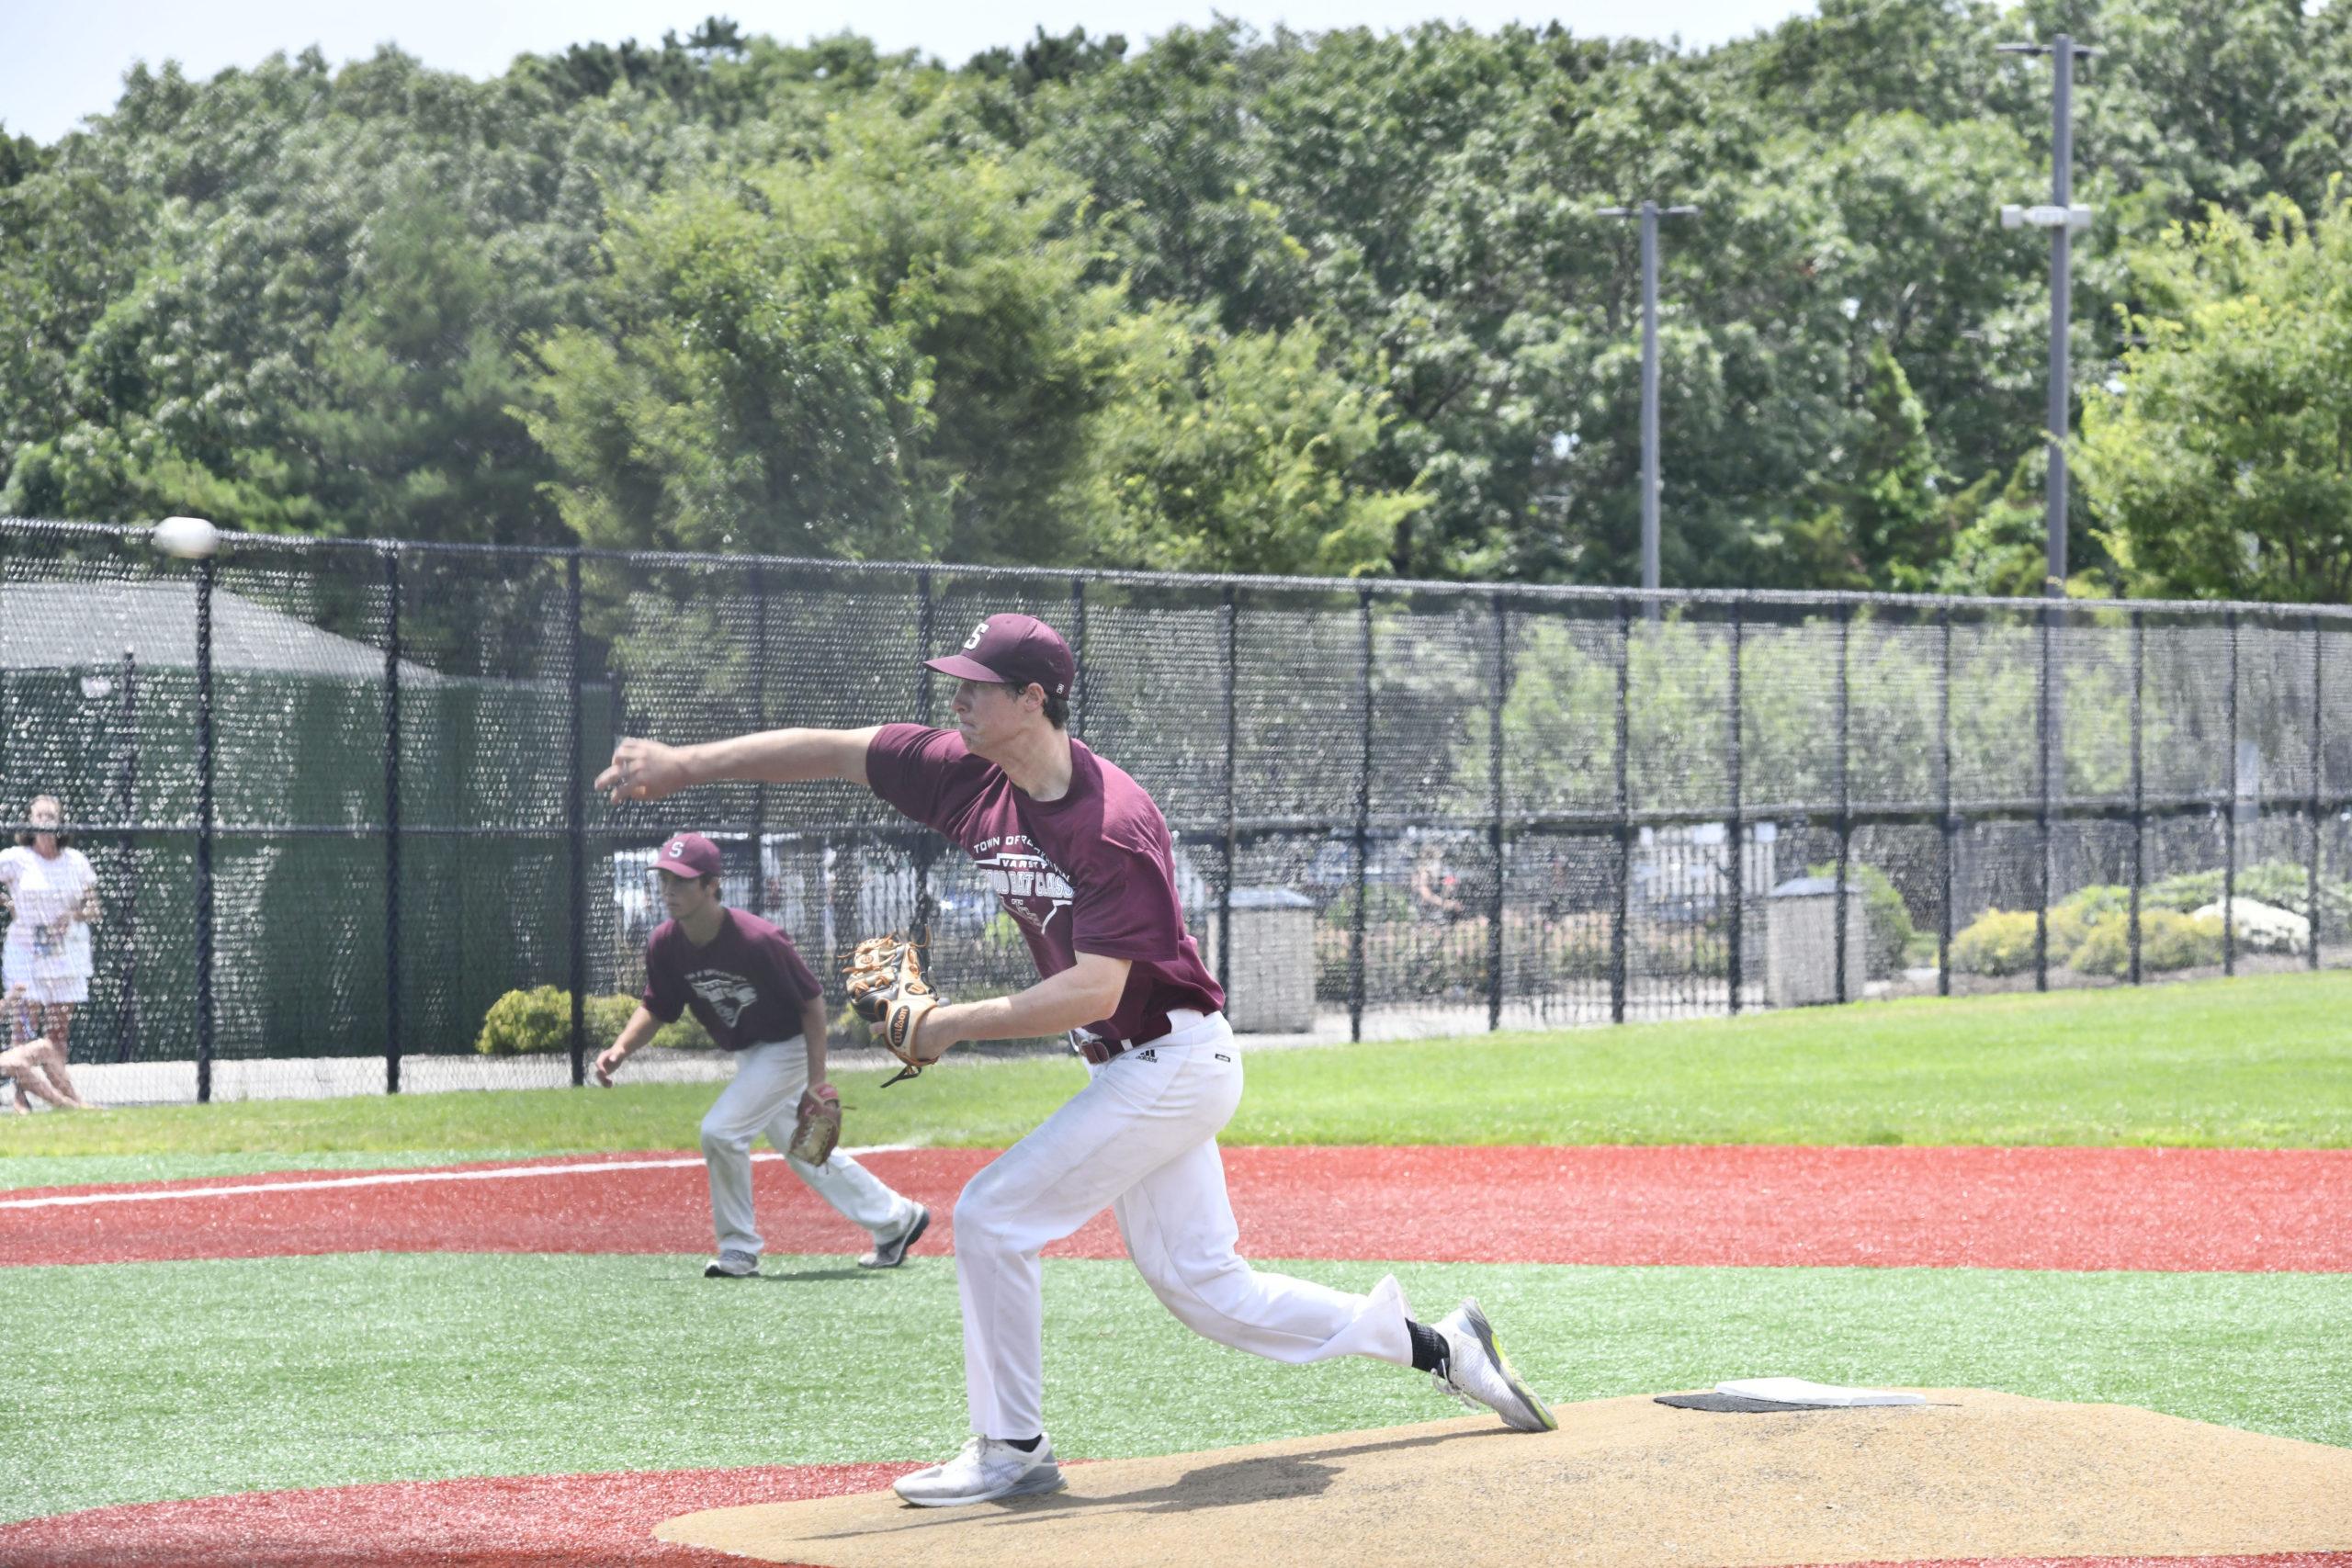 Mariner pitcher James Malone on the mound on Monday.